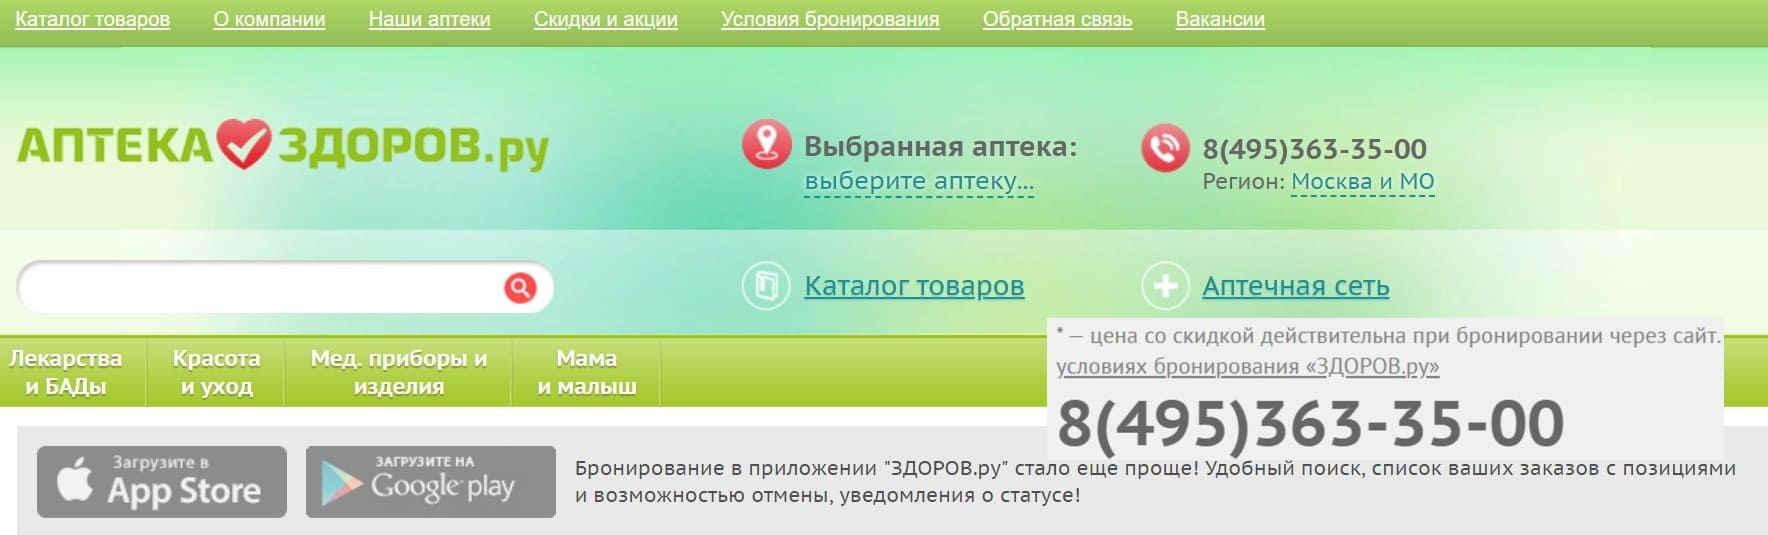 Сайт аптеки Здоров Ру